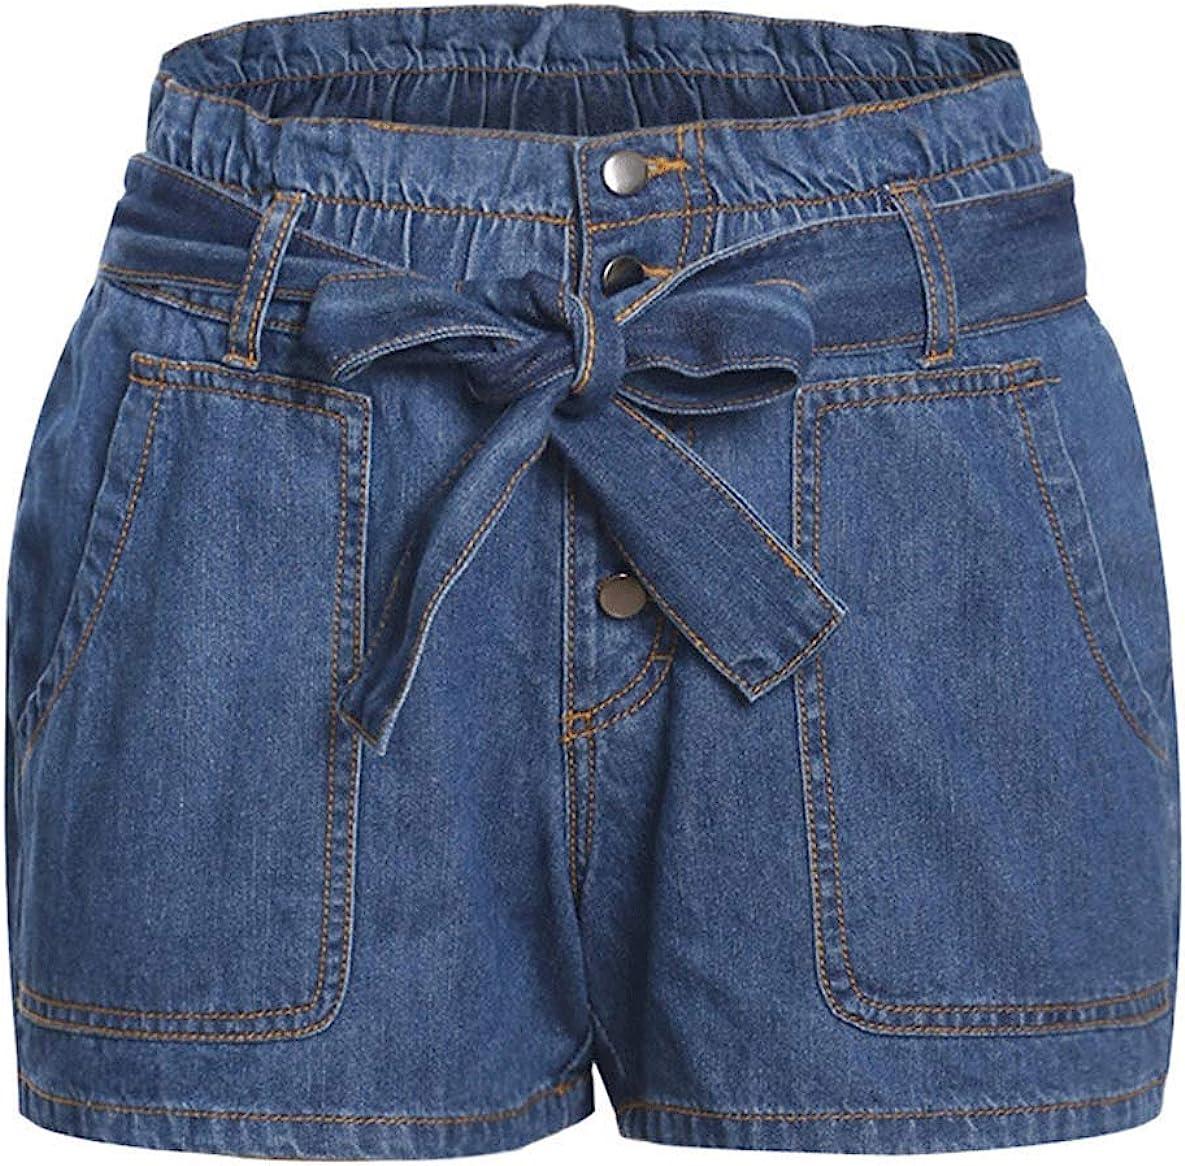 chouyatou Women's Casual Paper Bag Tie Waist Sewn Cuffed Summer Denim Jean Shorts